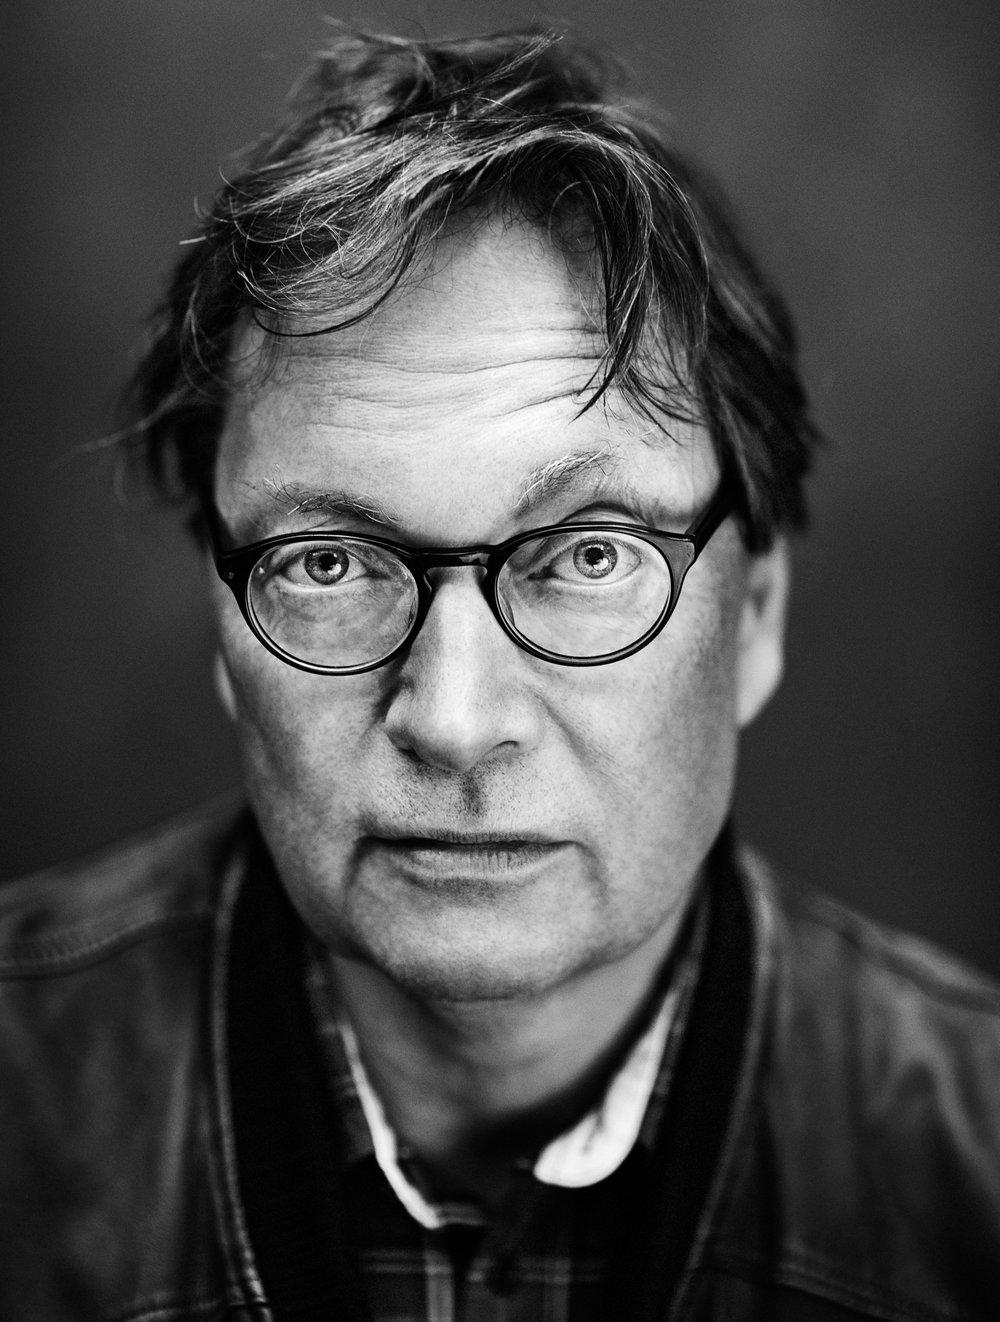 portraits_image__Kristofer Samuelsson Photography 2014-92.jpg